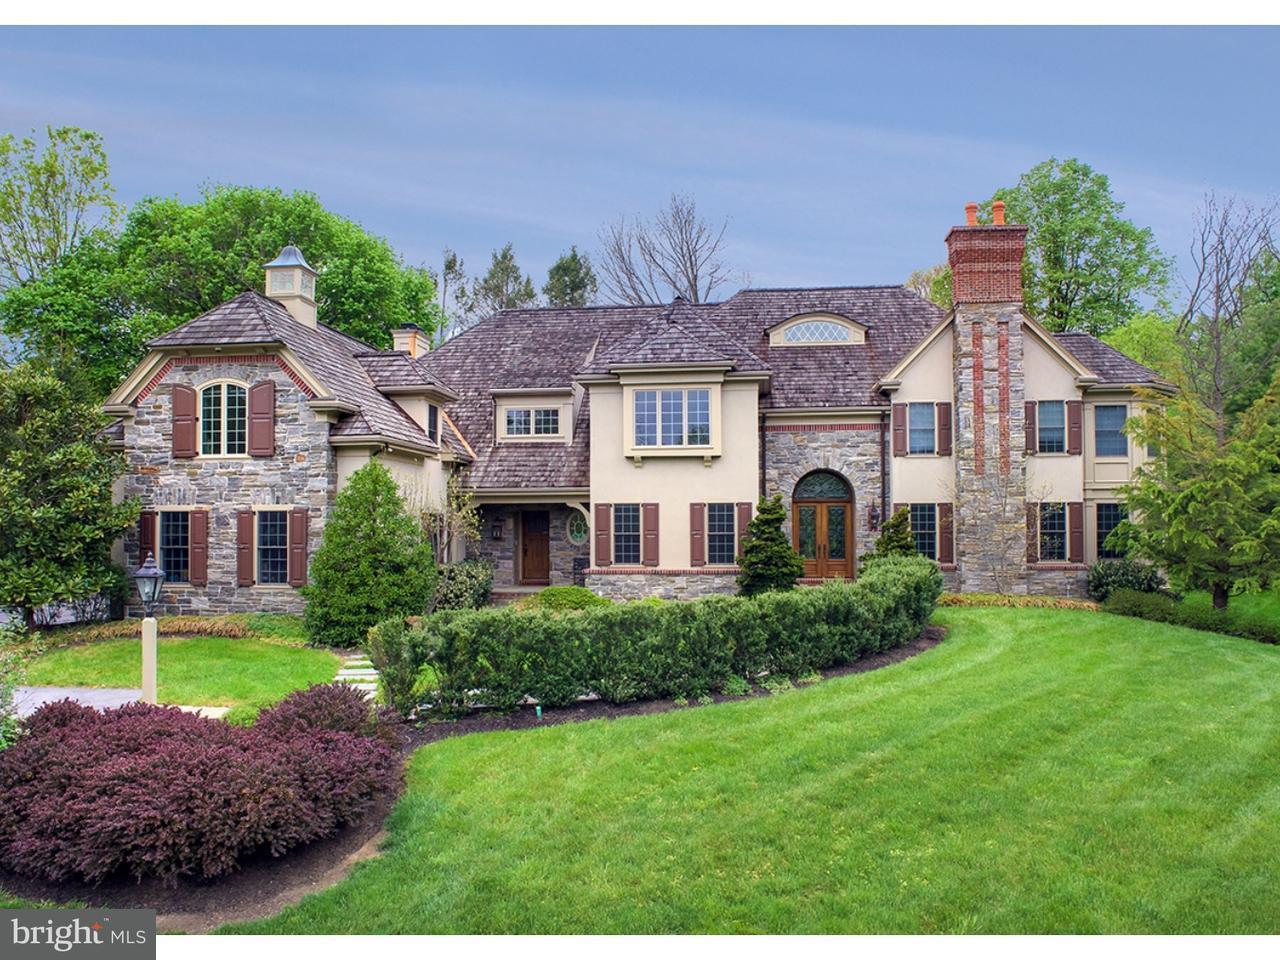 Single Family Home for Sale at 654 BROOKE Road Wayne, Pennsylvania 19087 United States